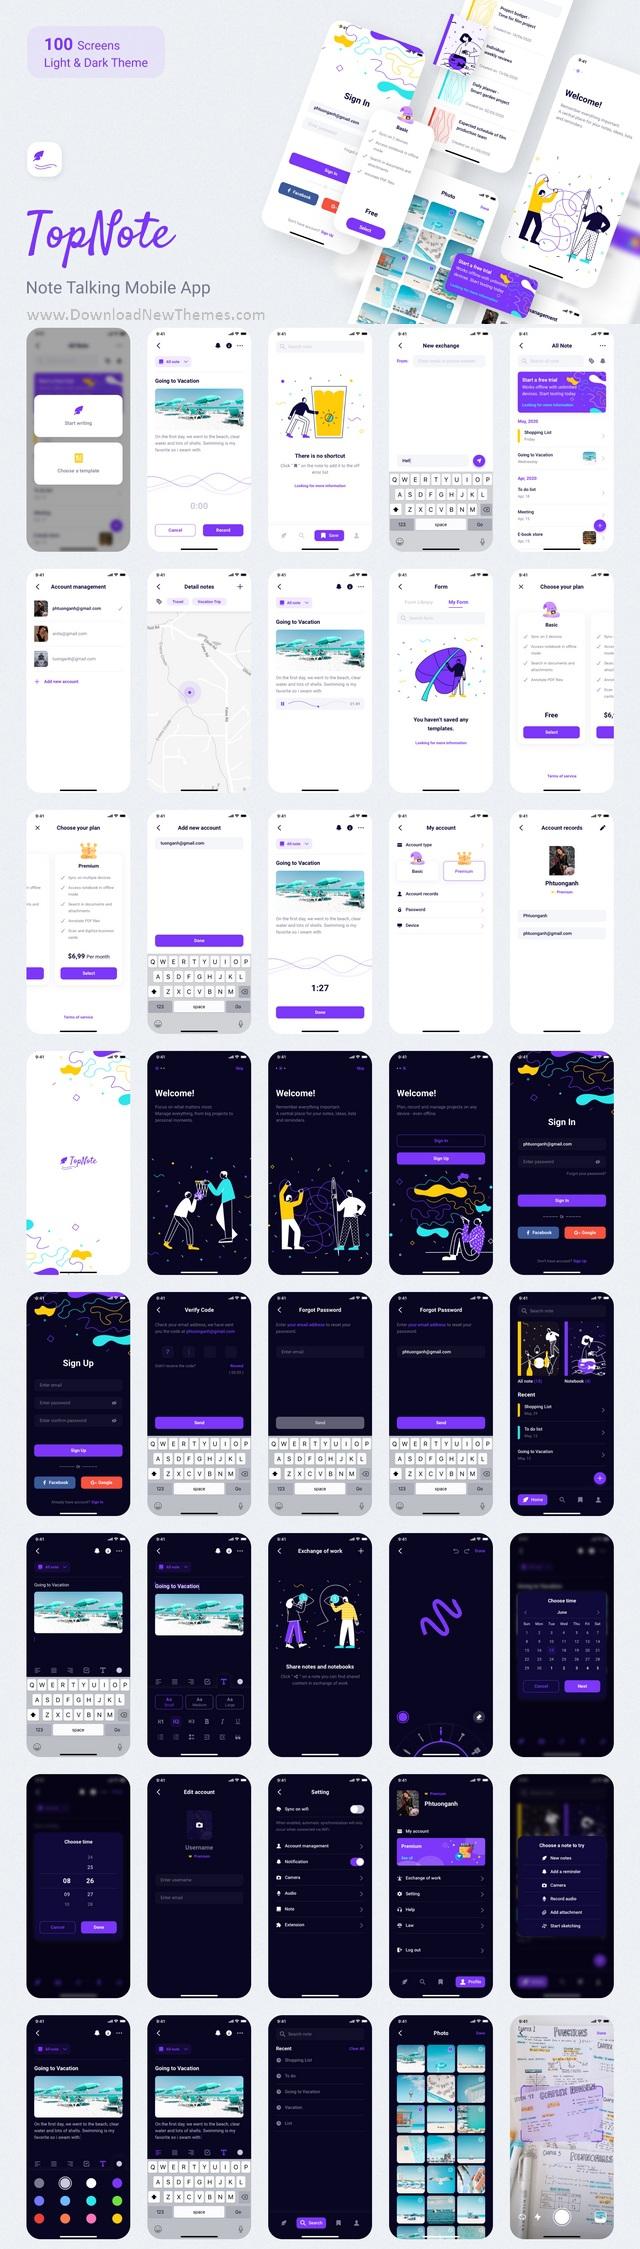 Best Note Talking Mobile App Template